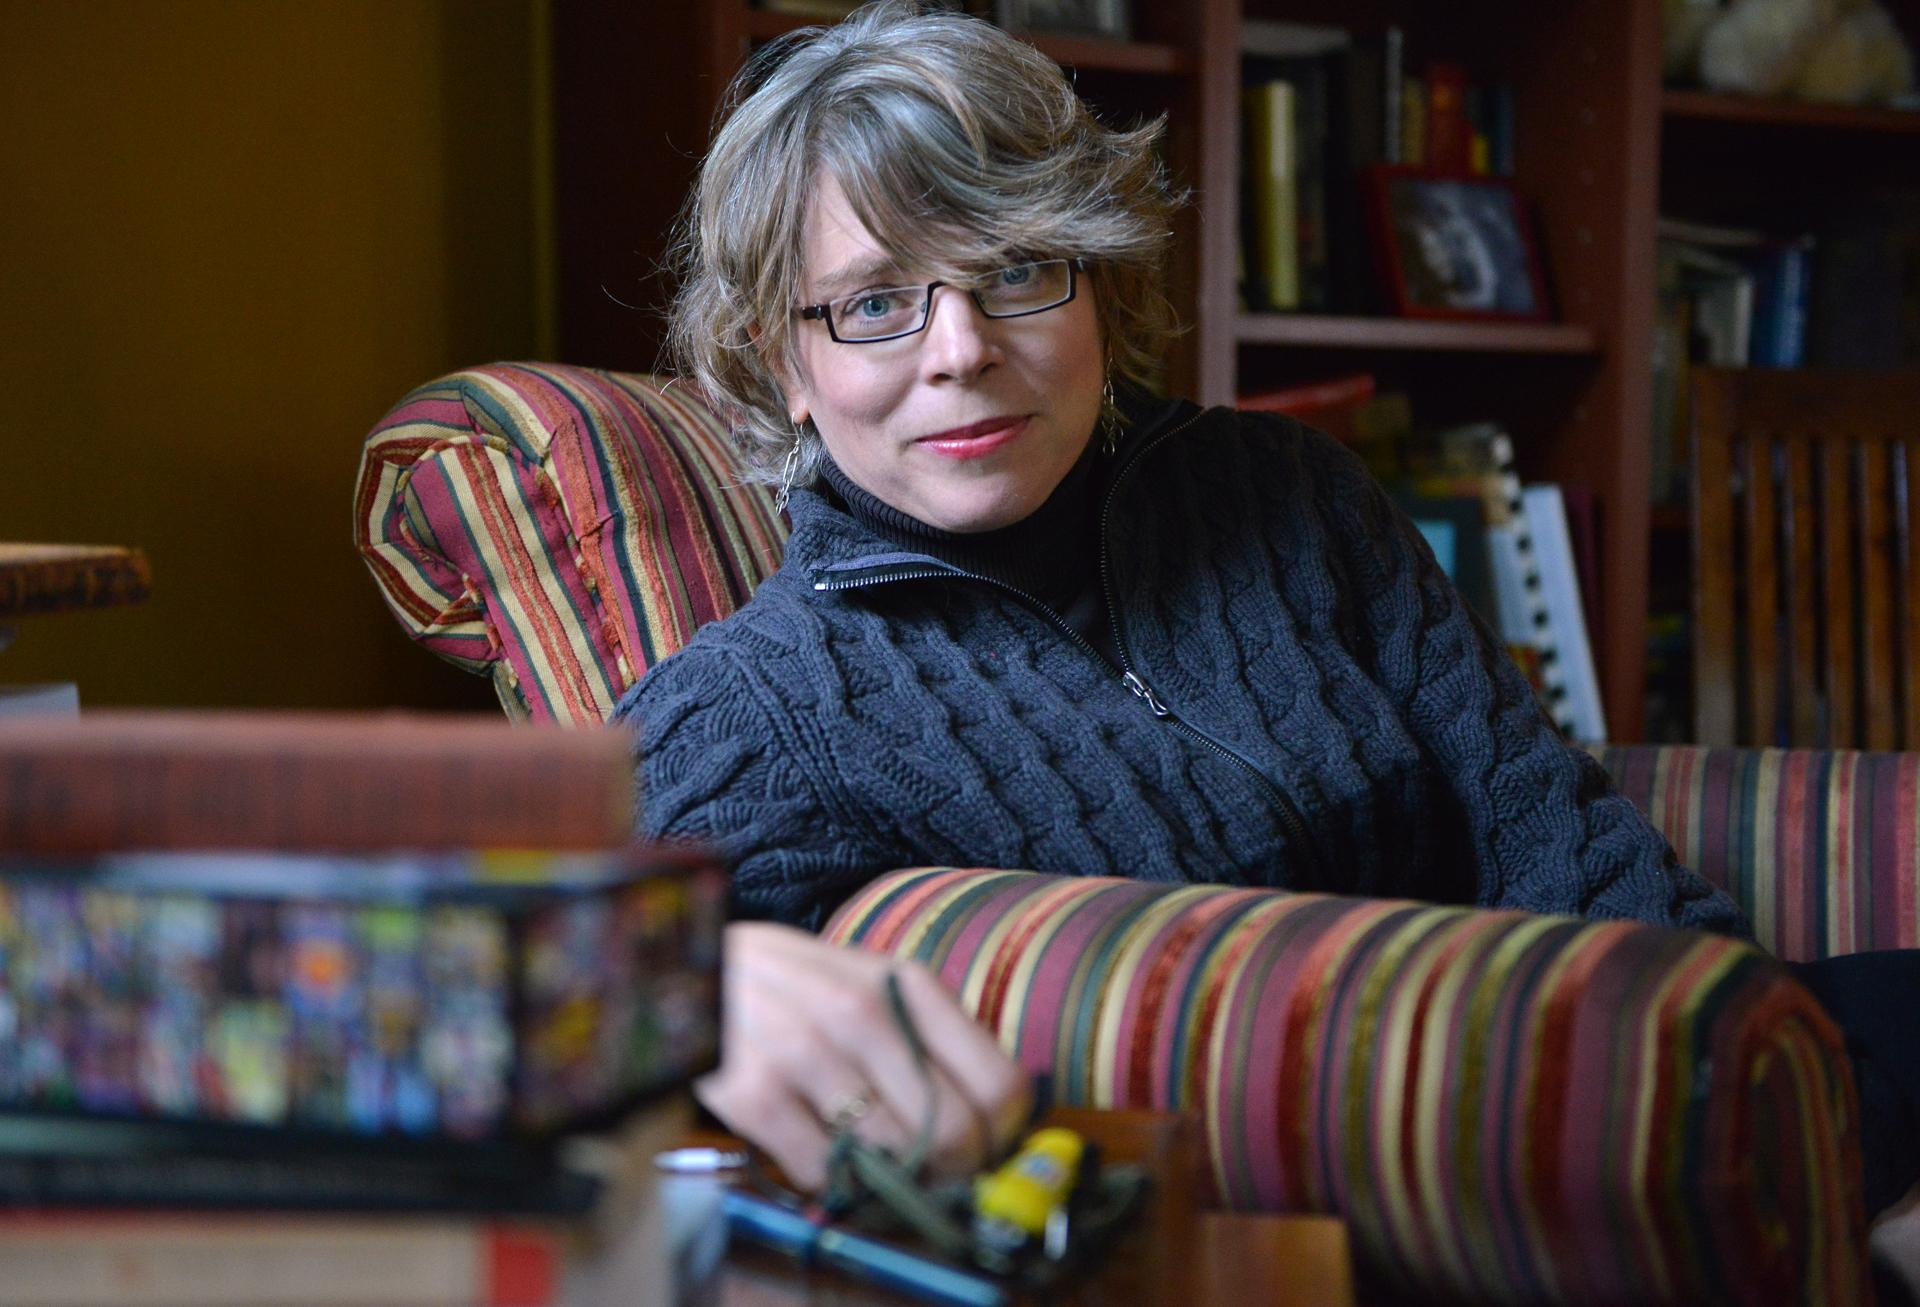 Historian And Harvard Professor Jill Lepore In The Living Room Of Her Cambridge Home Josh